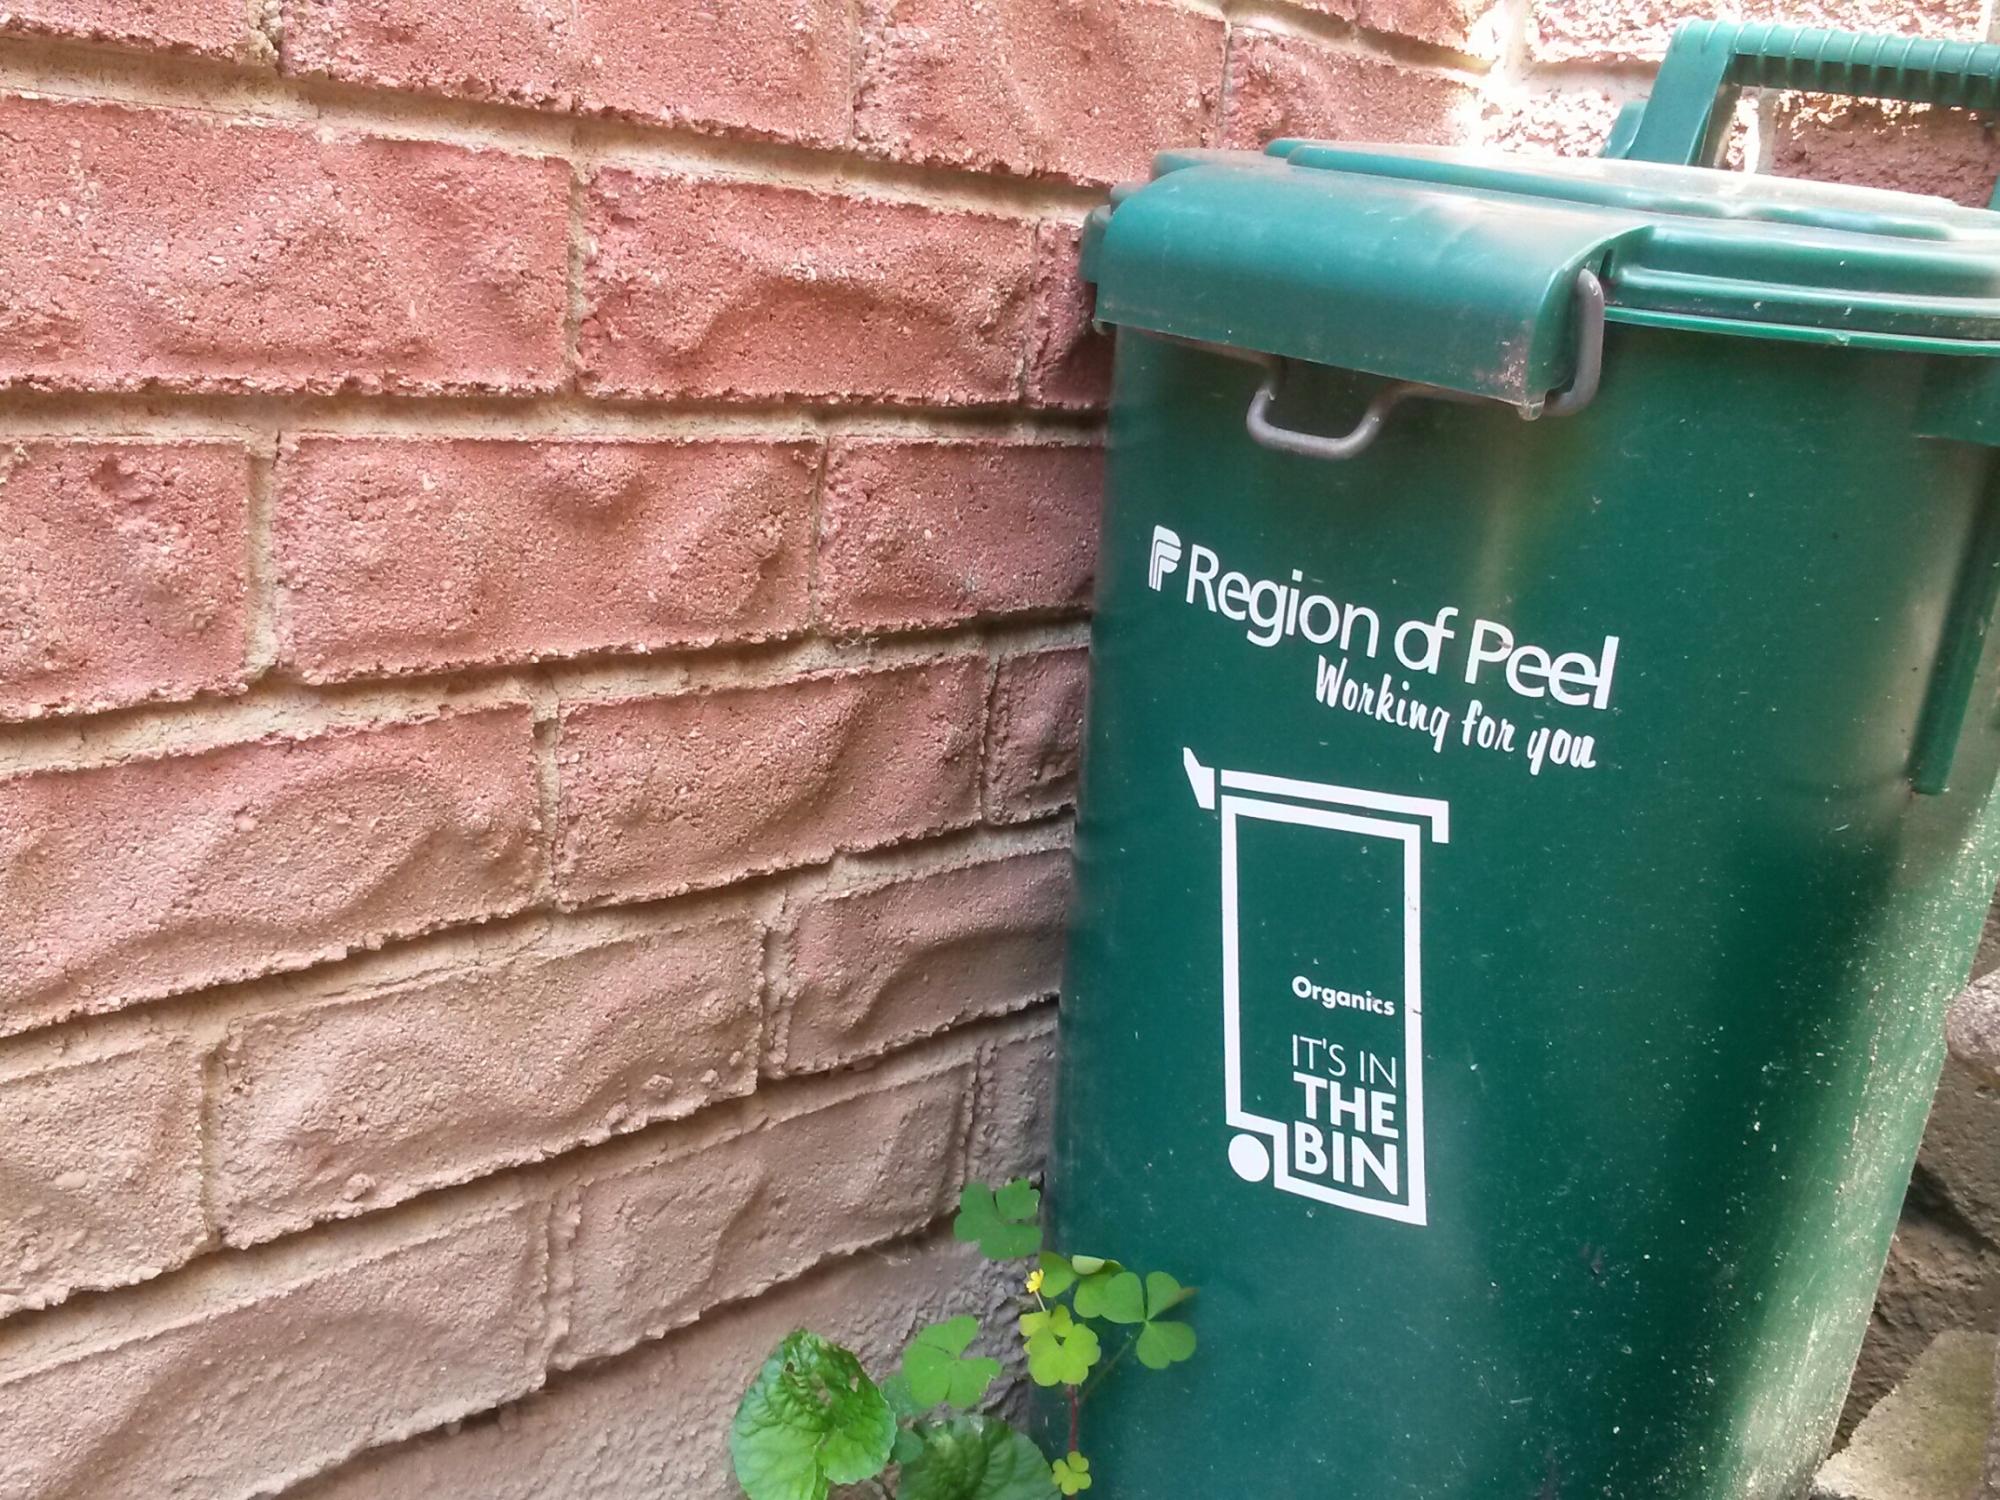 Return Those Green Bins Peel Residents